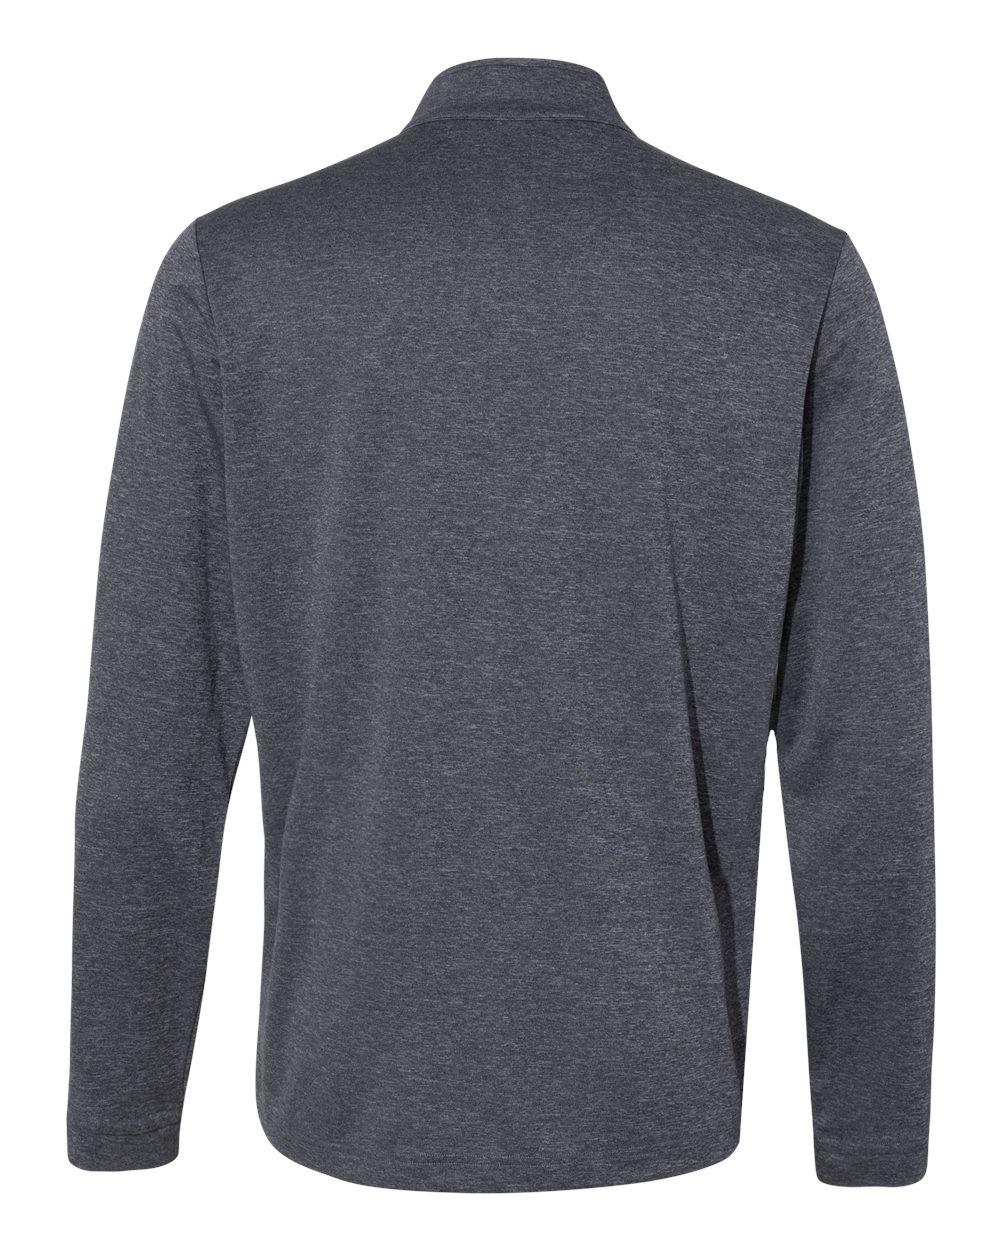 Adidas-Mens-Lightweight-UPF-pullover-Shirt-Warmup-A280-up-to-4XL thumbnail 7